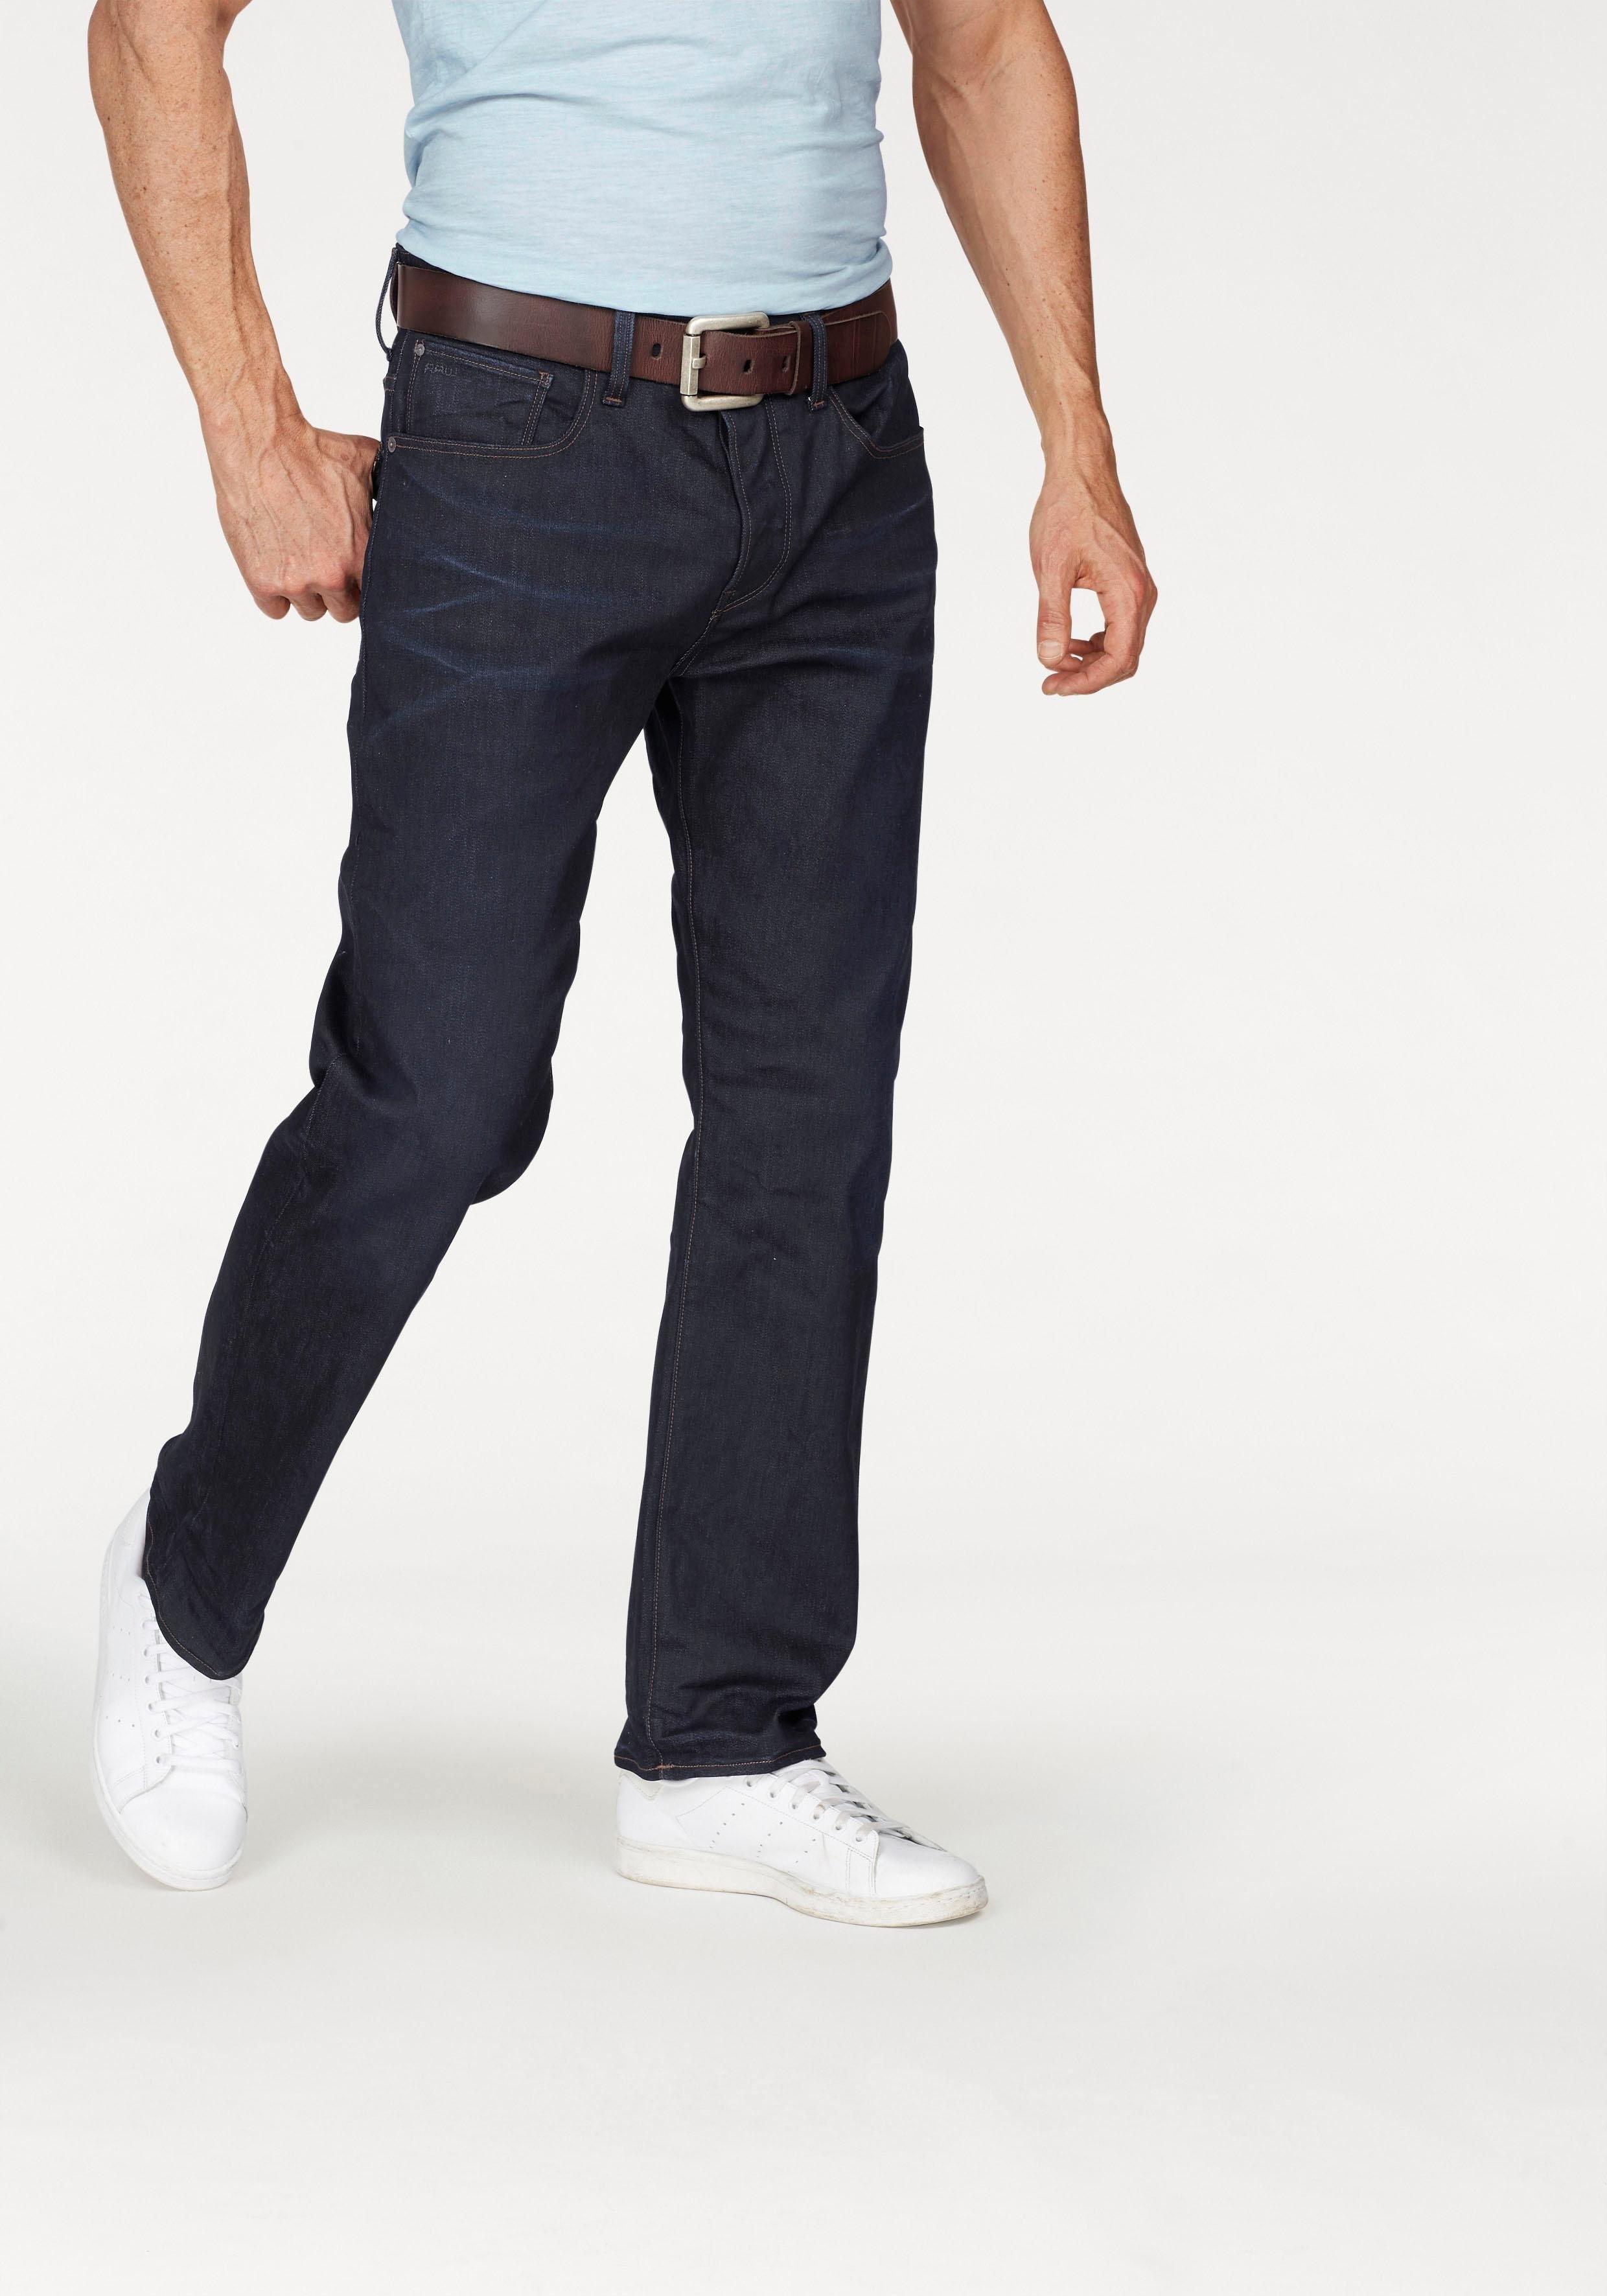 G-Star RAW stretch jeans 3301 Loose goedkoop op otto.nl kopen